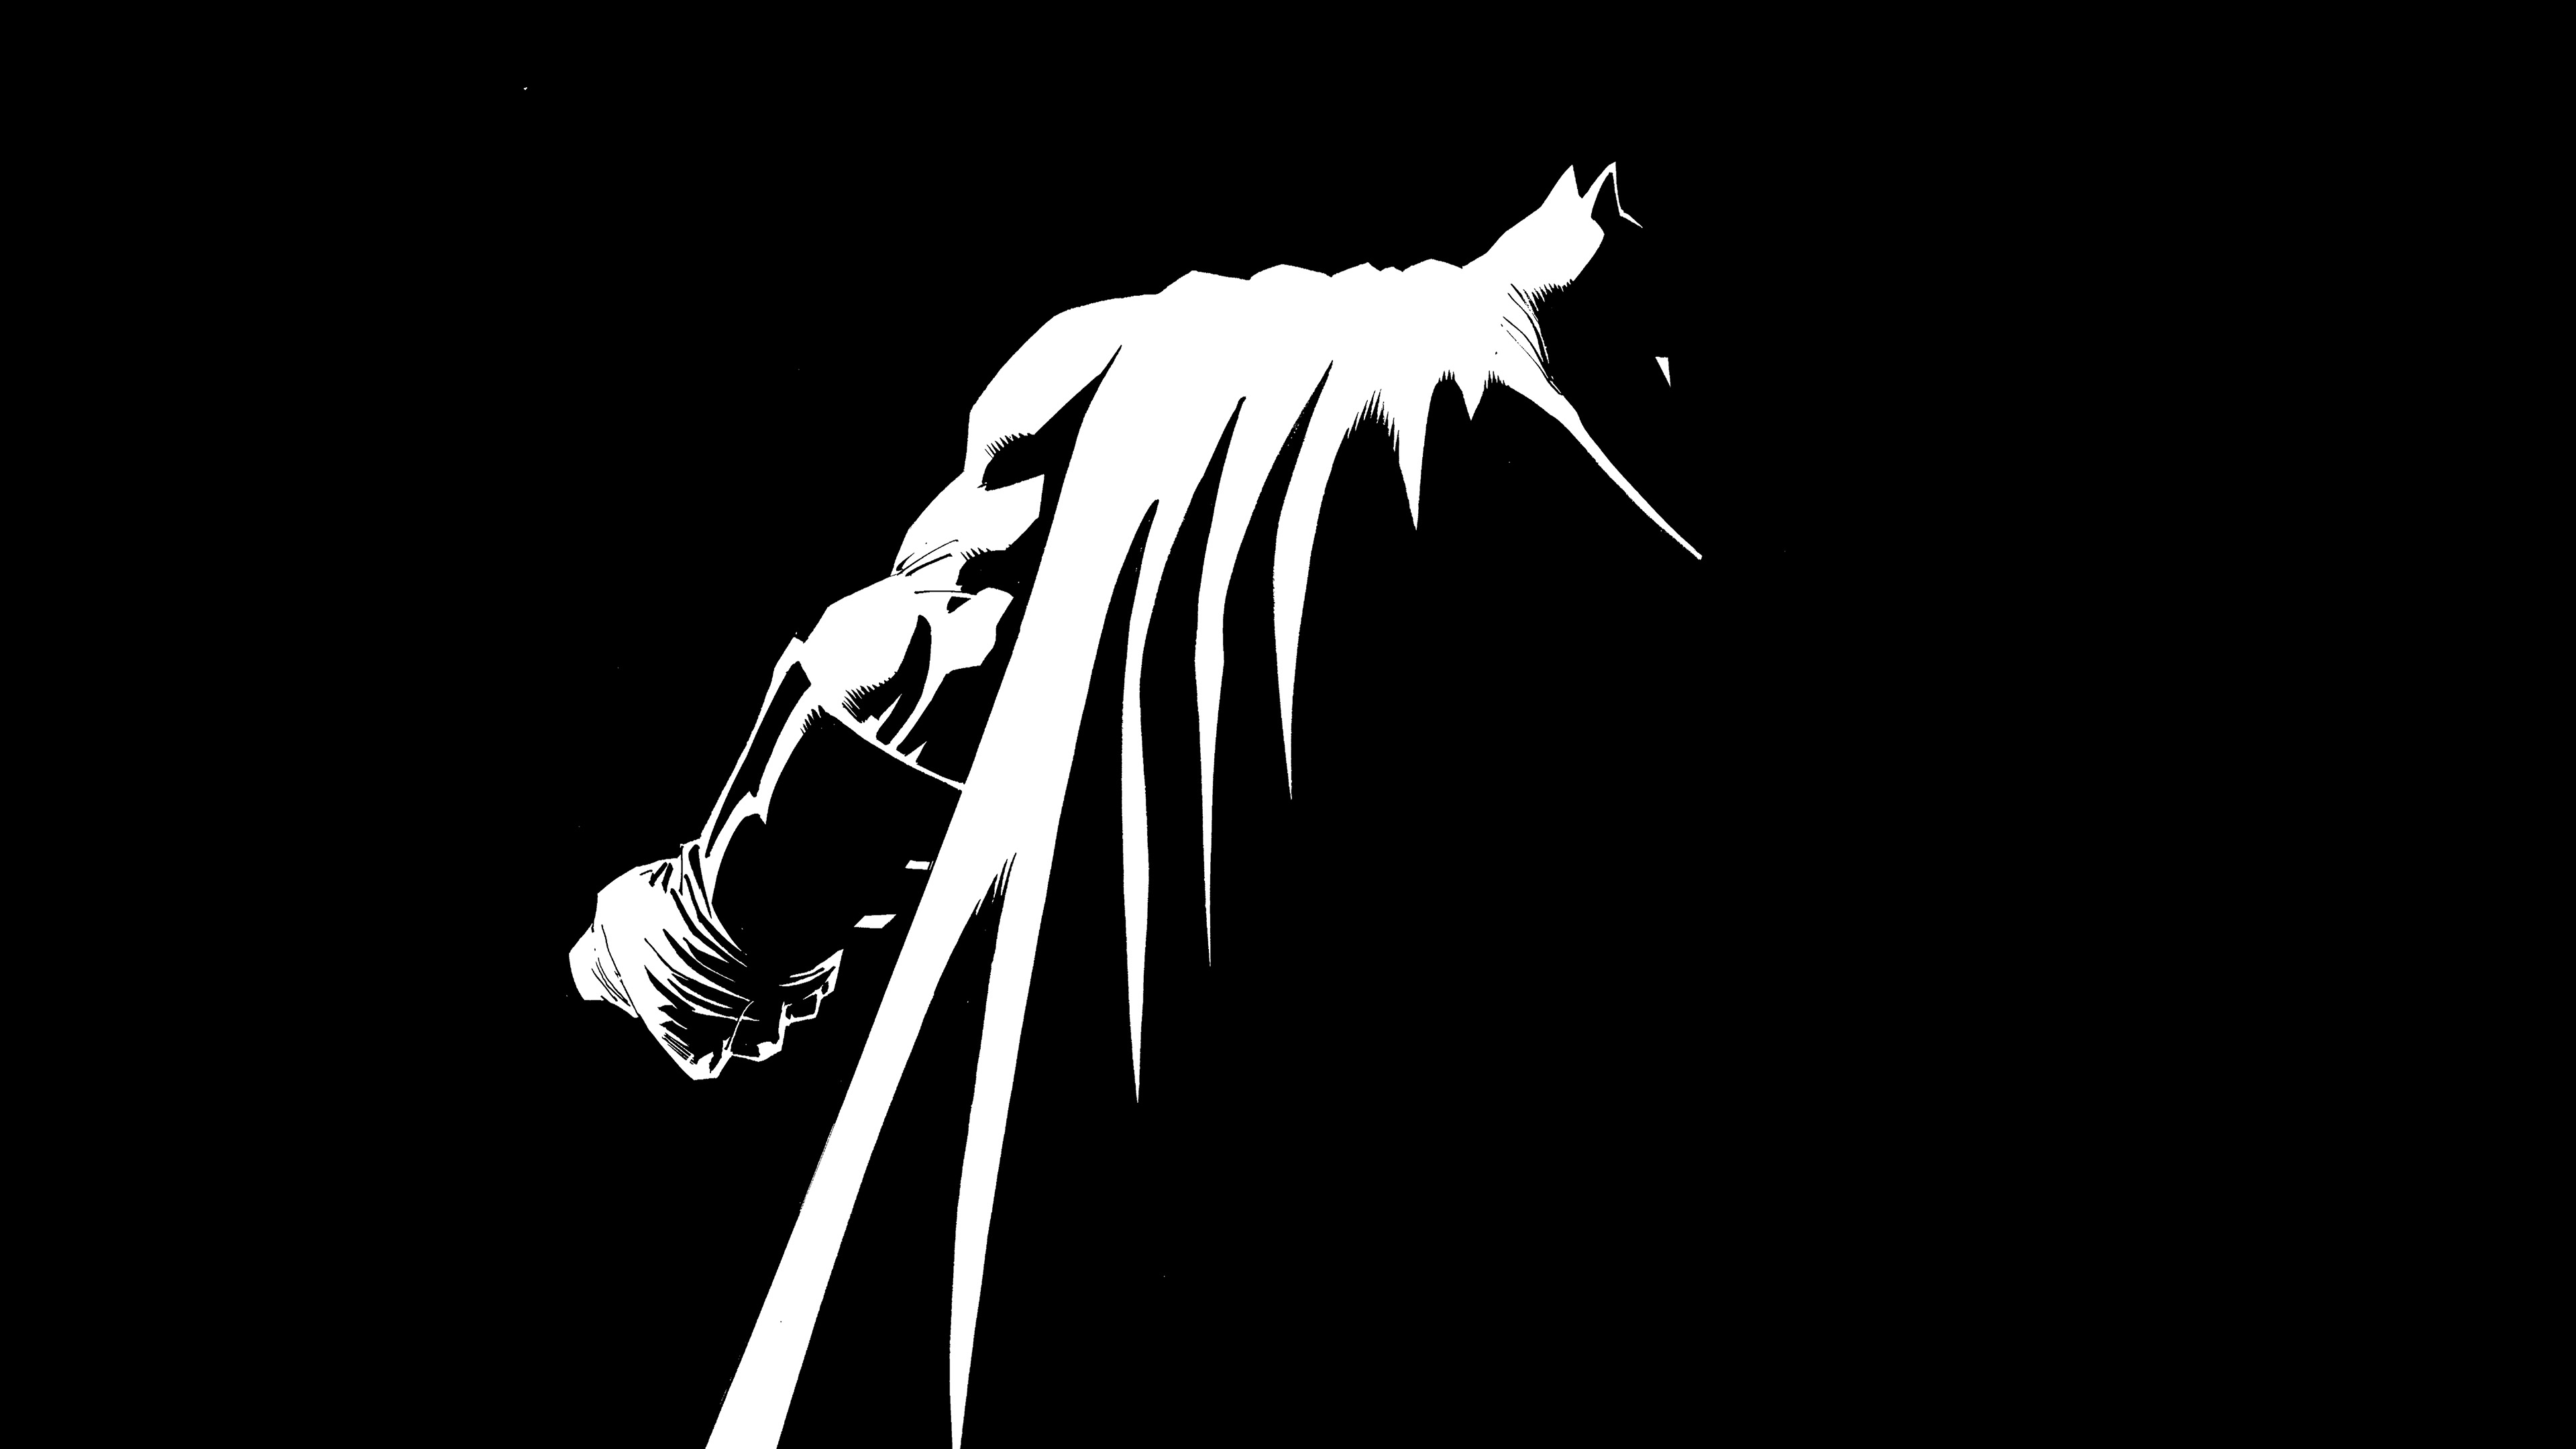 Ar30 Batman Simple Dark Art Minimal Wallpaper